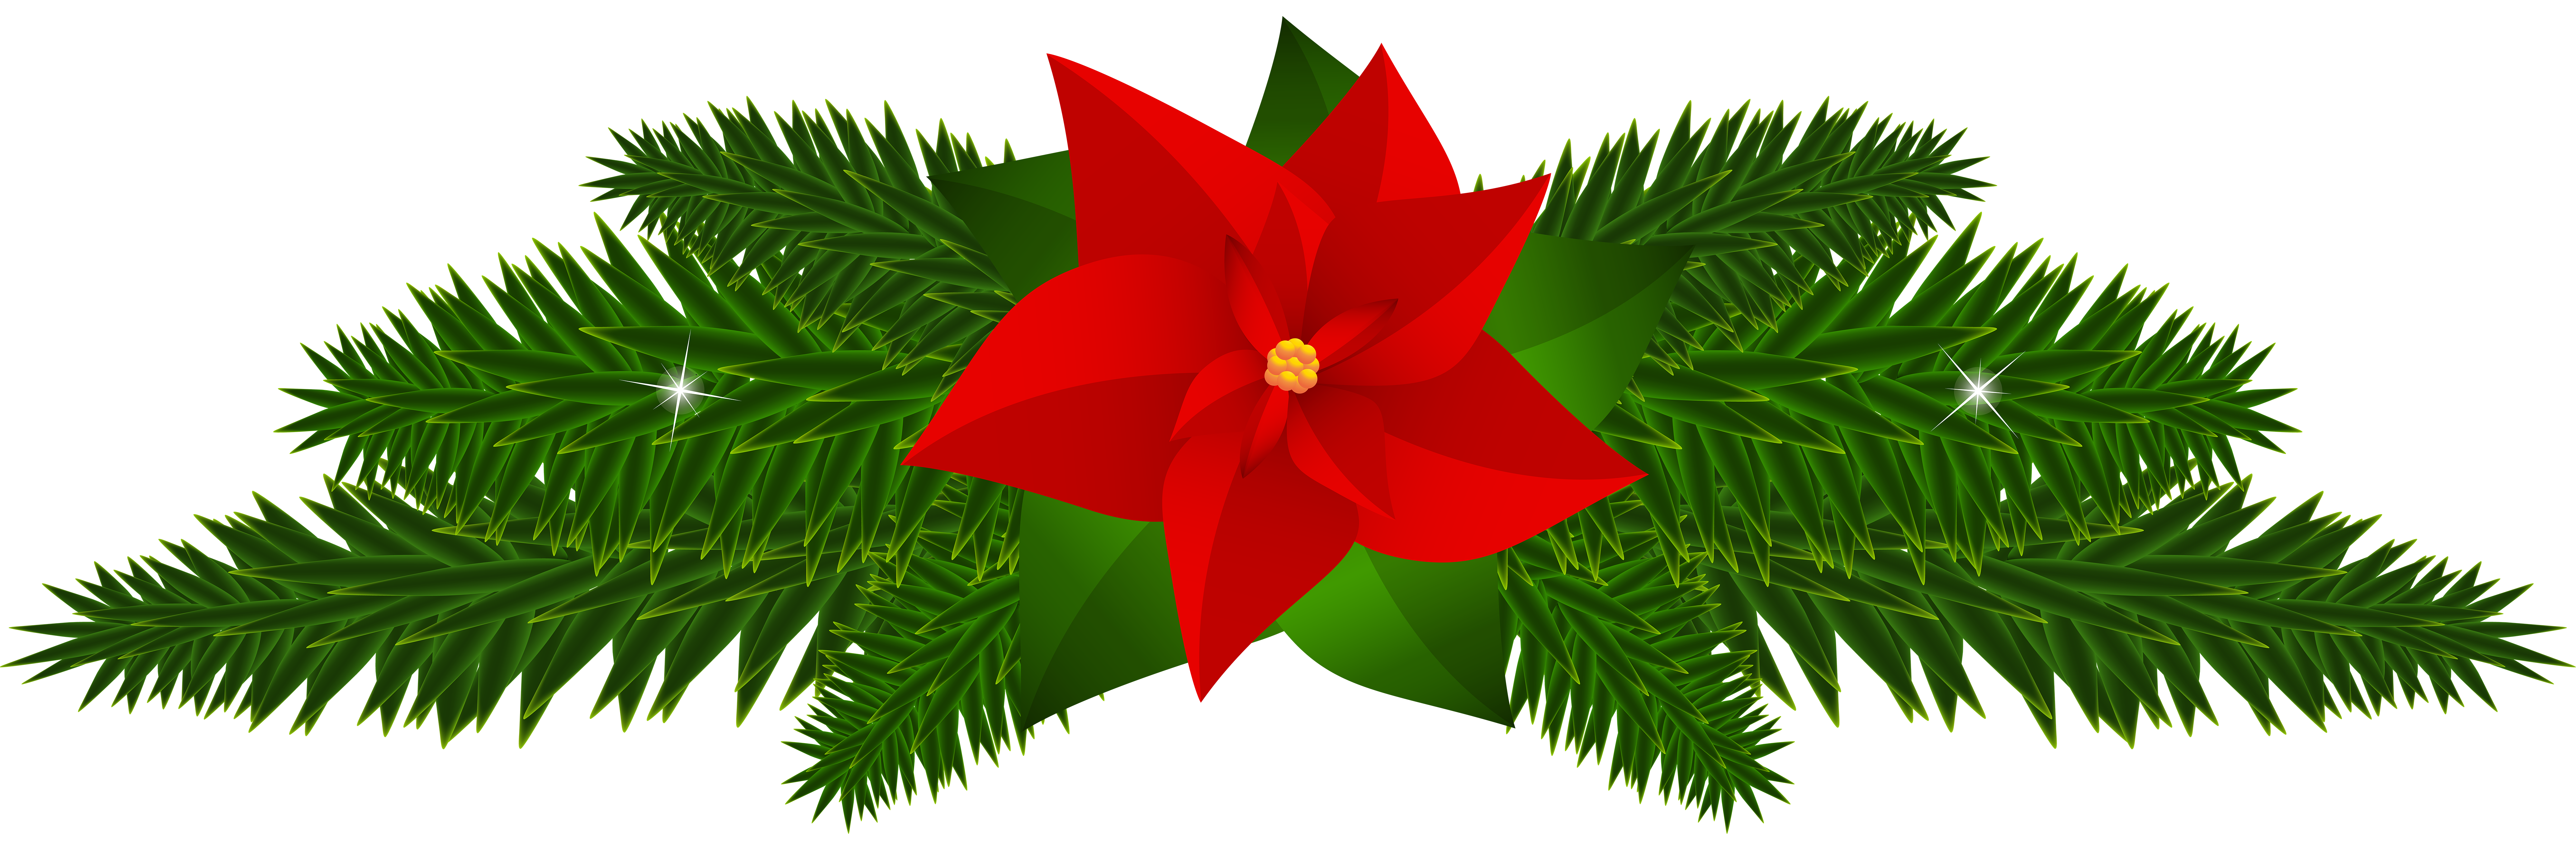 8000x2640 Christmas Poinsettia Decoration Png Clip Artu200b Gallery